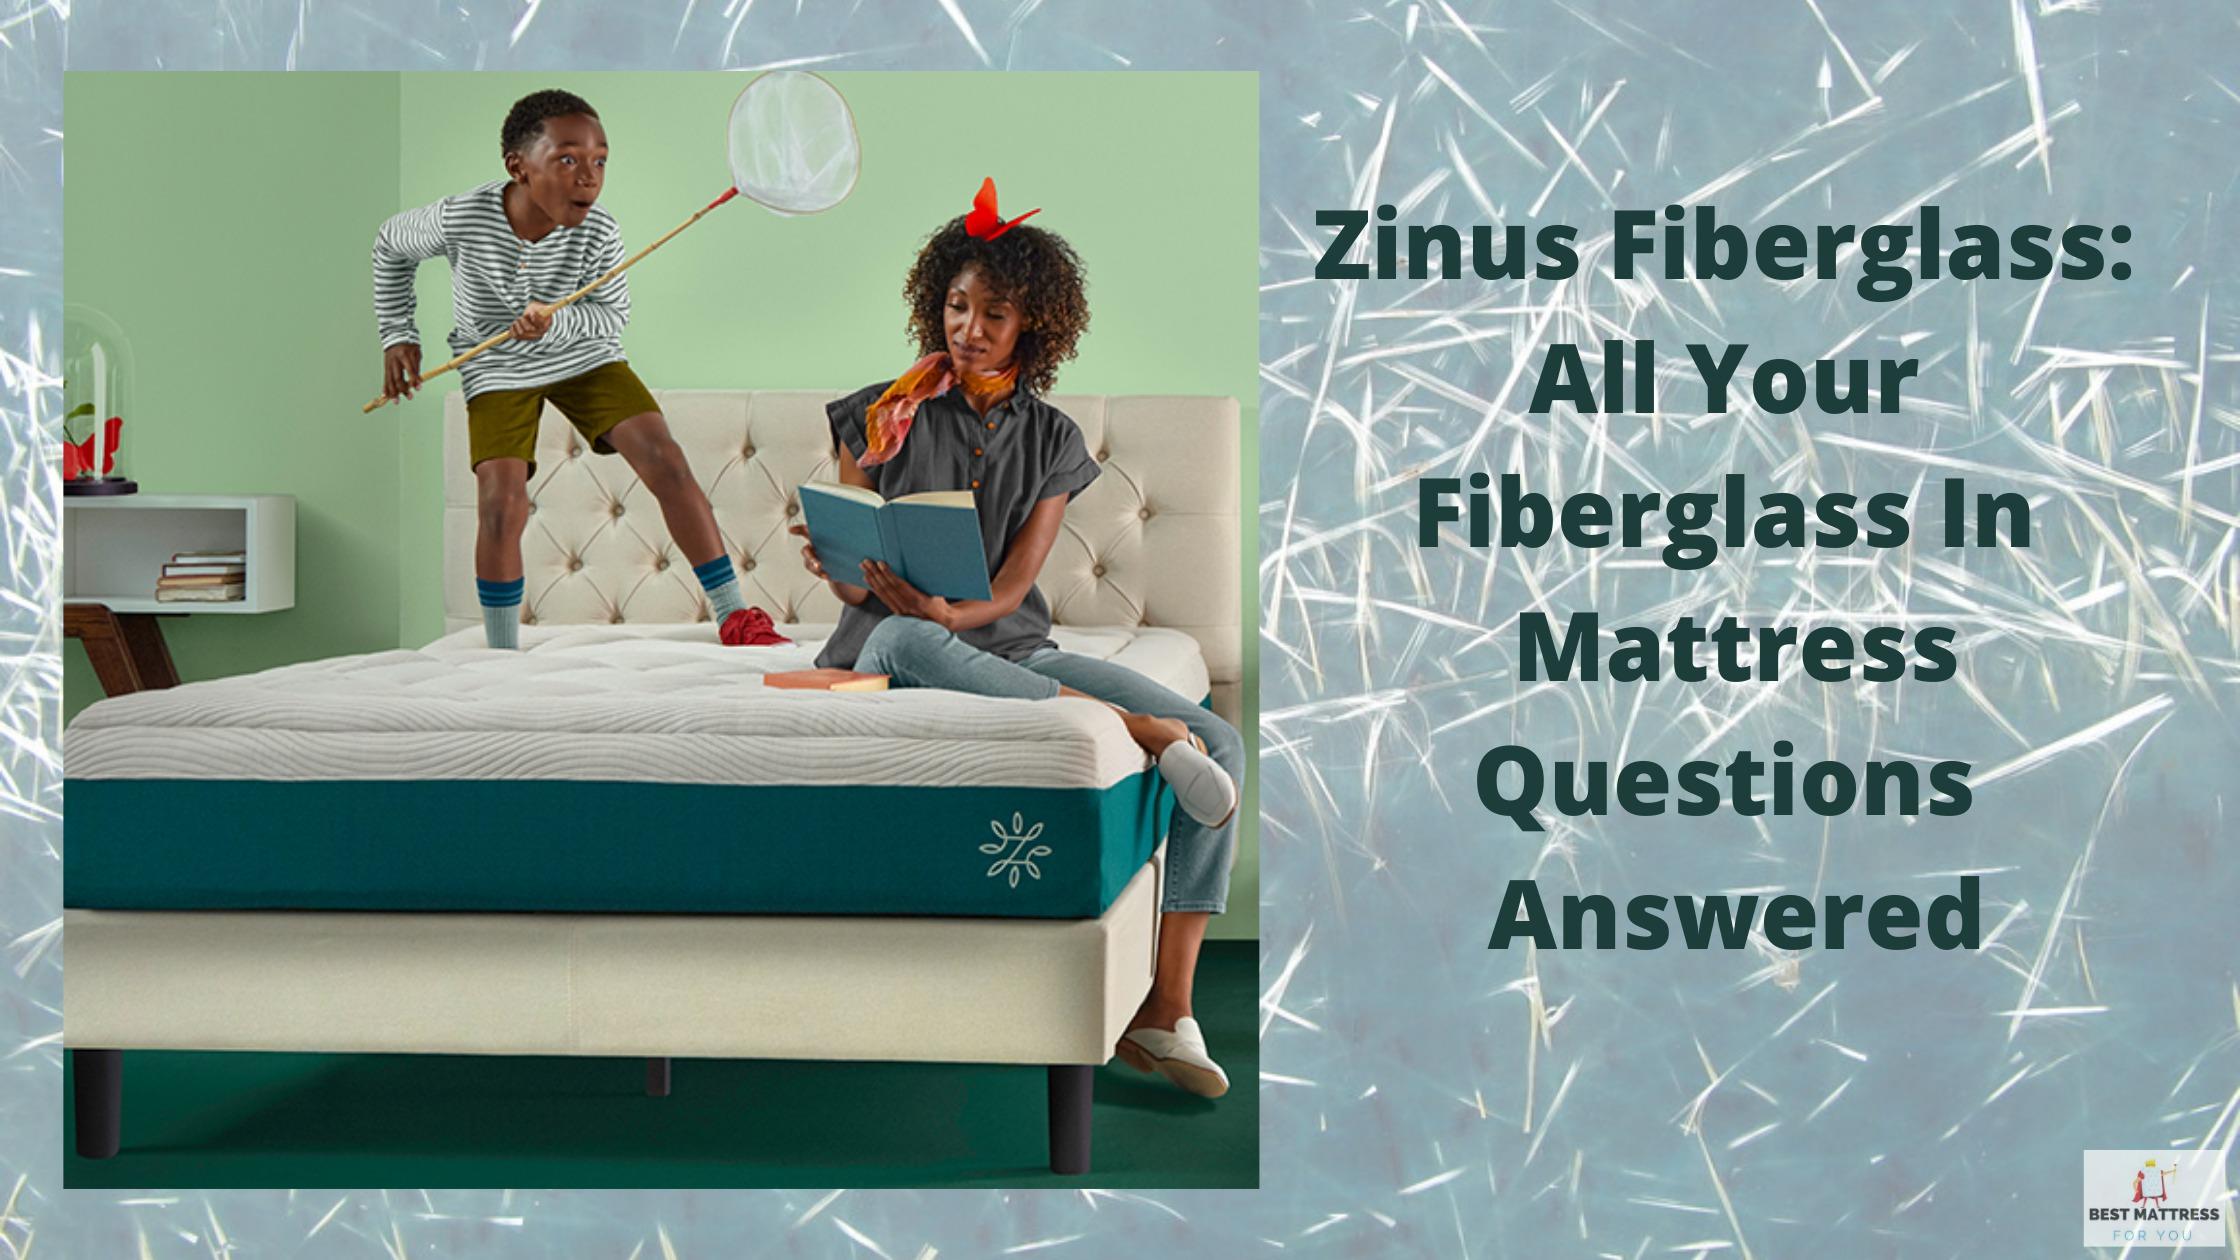 Zinus Fiberglass: Cover Image